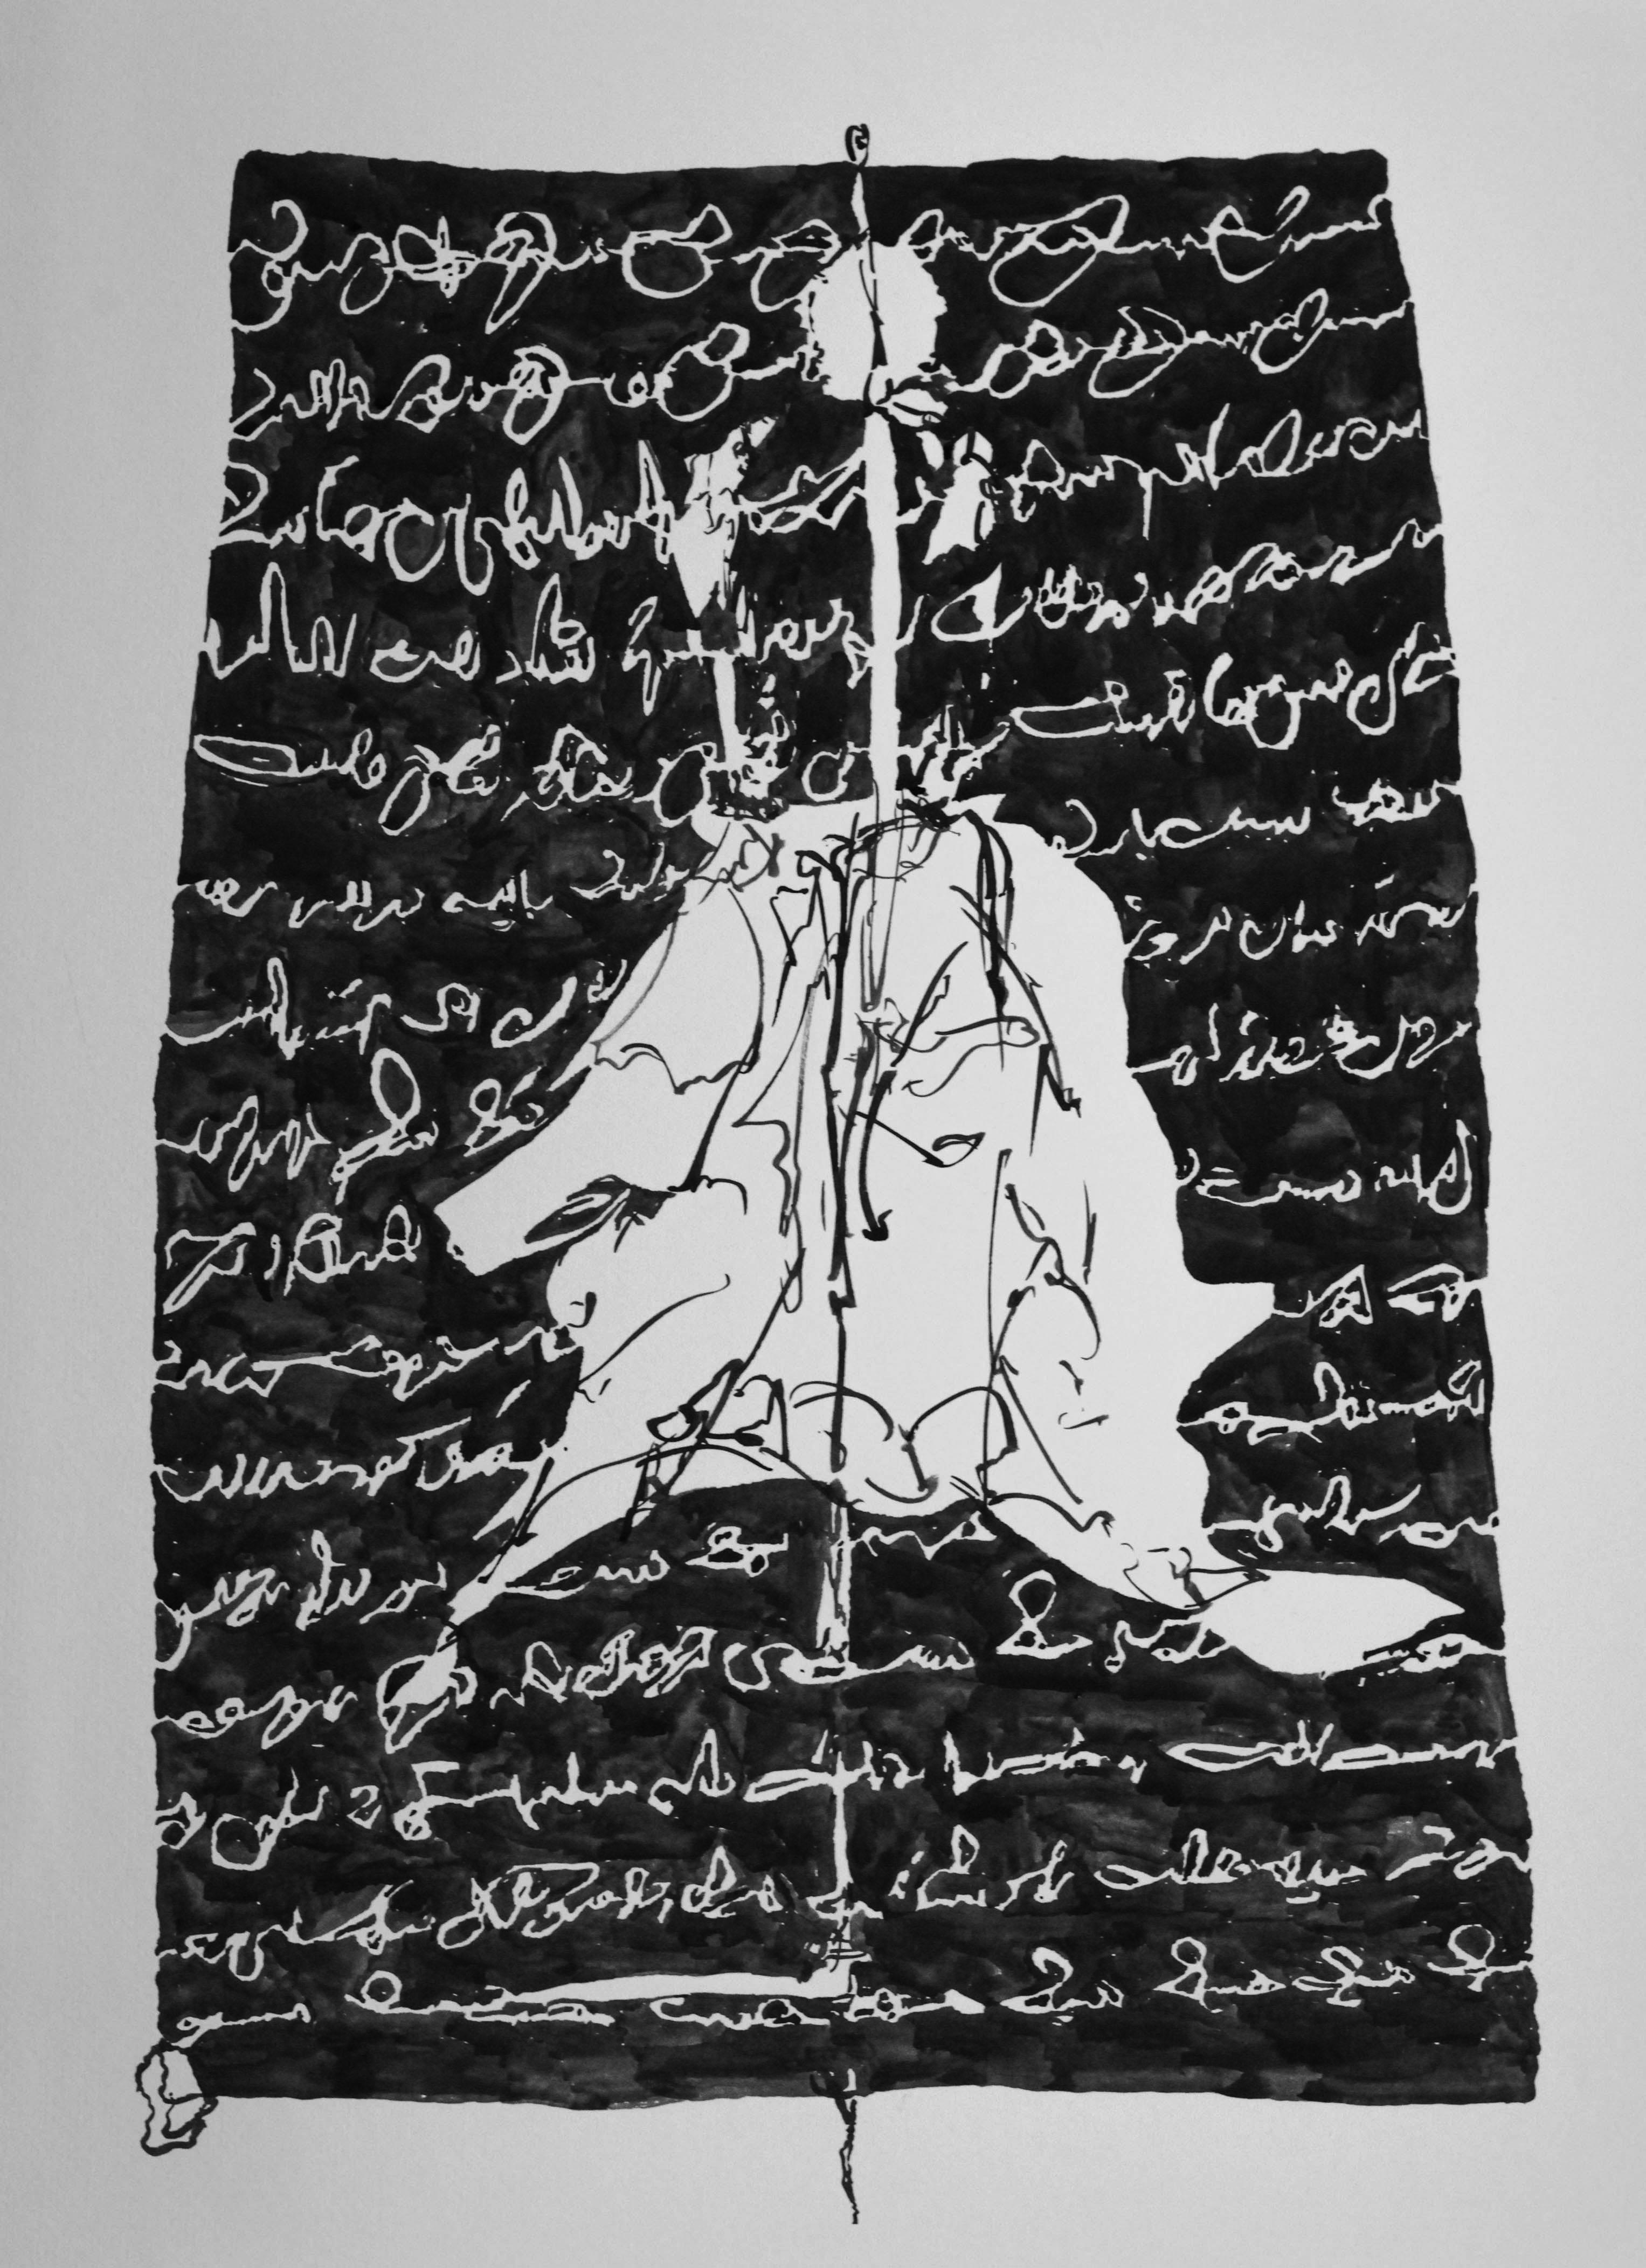 Untitled - Farzad Kohan - 24x18 - 2016 (2 of 4)